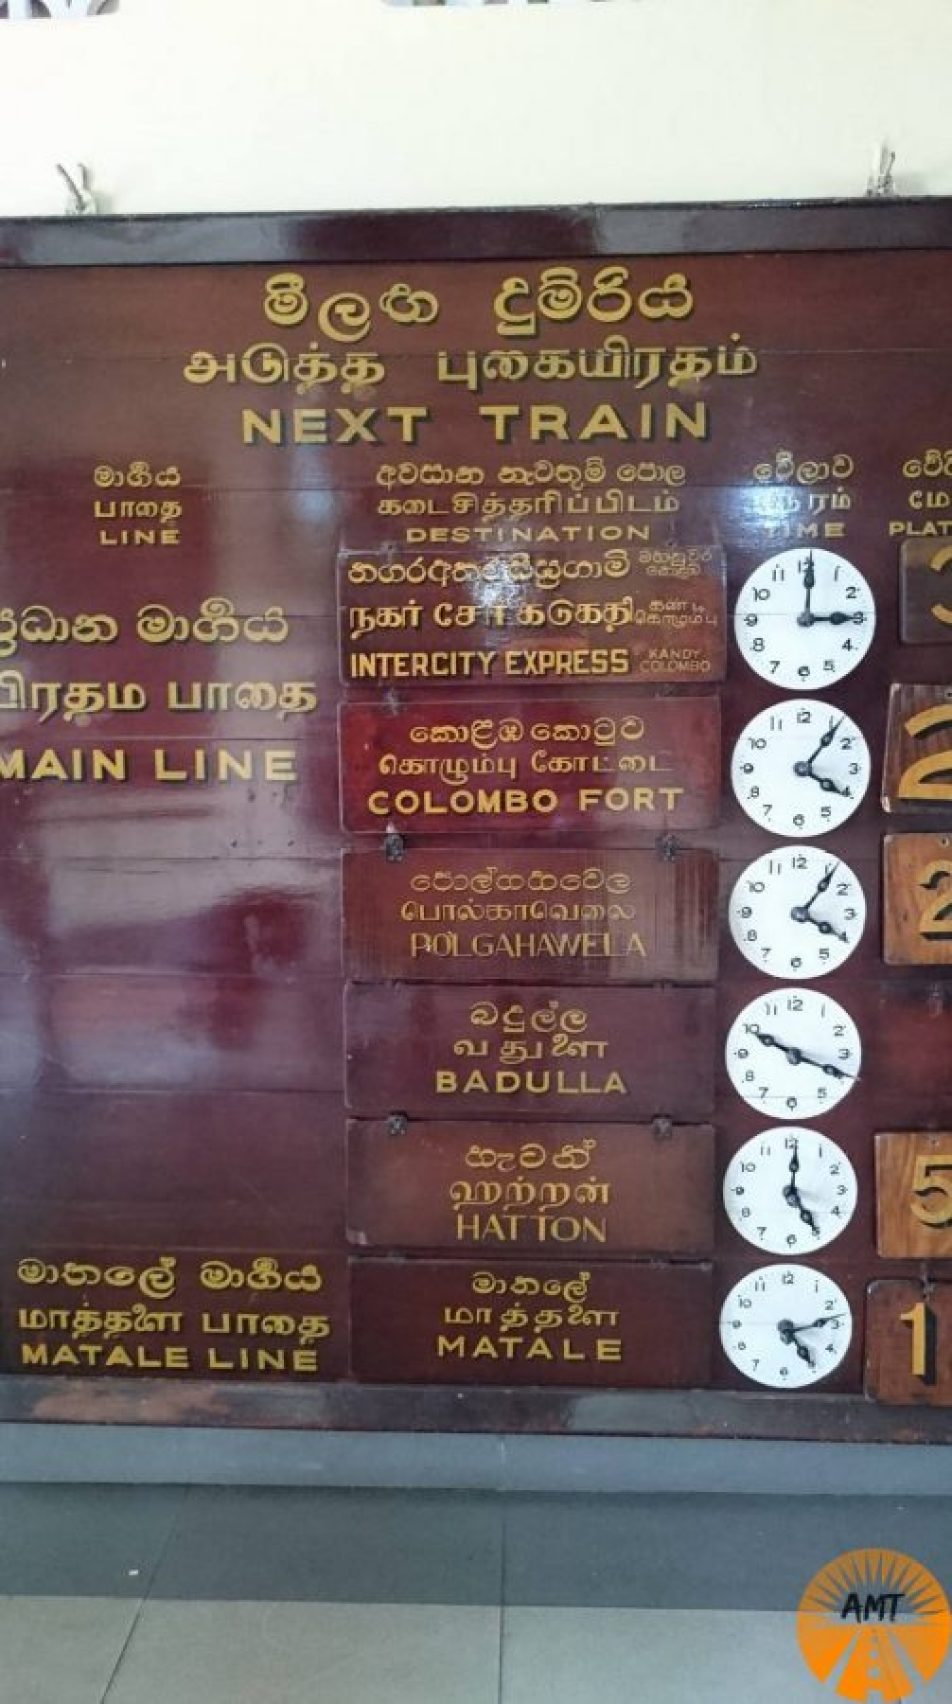 Kandy station, Sri Lanka